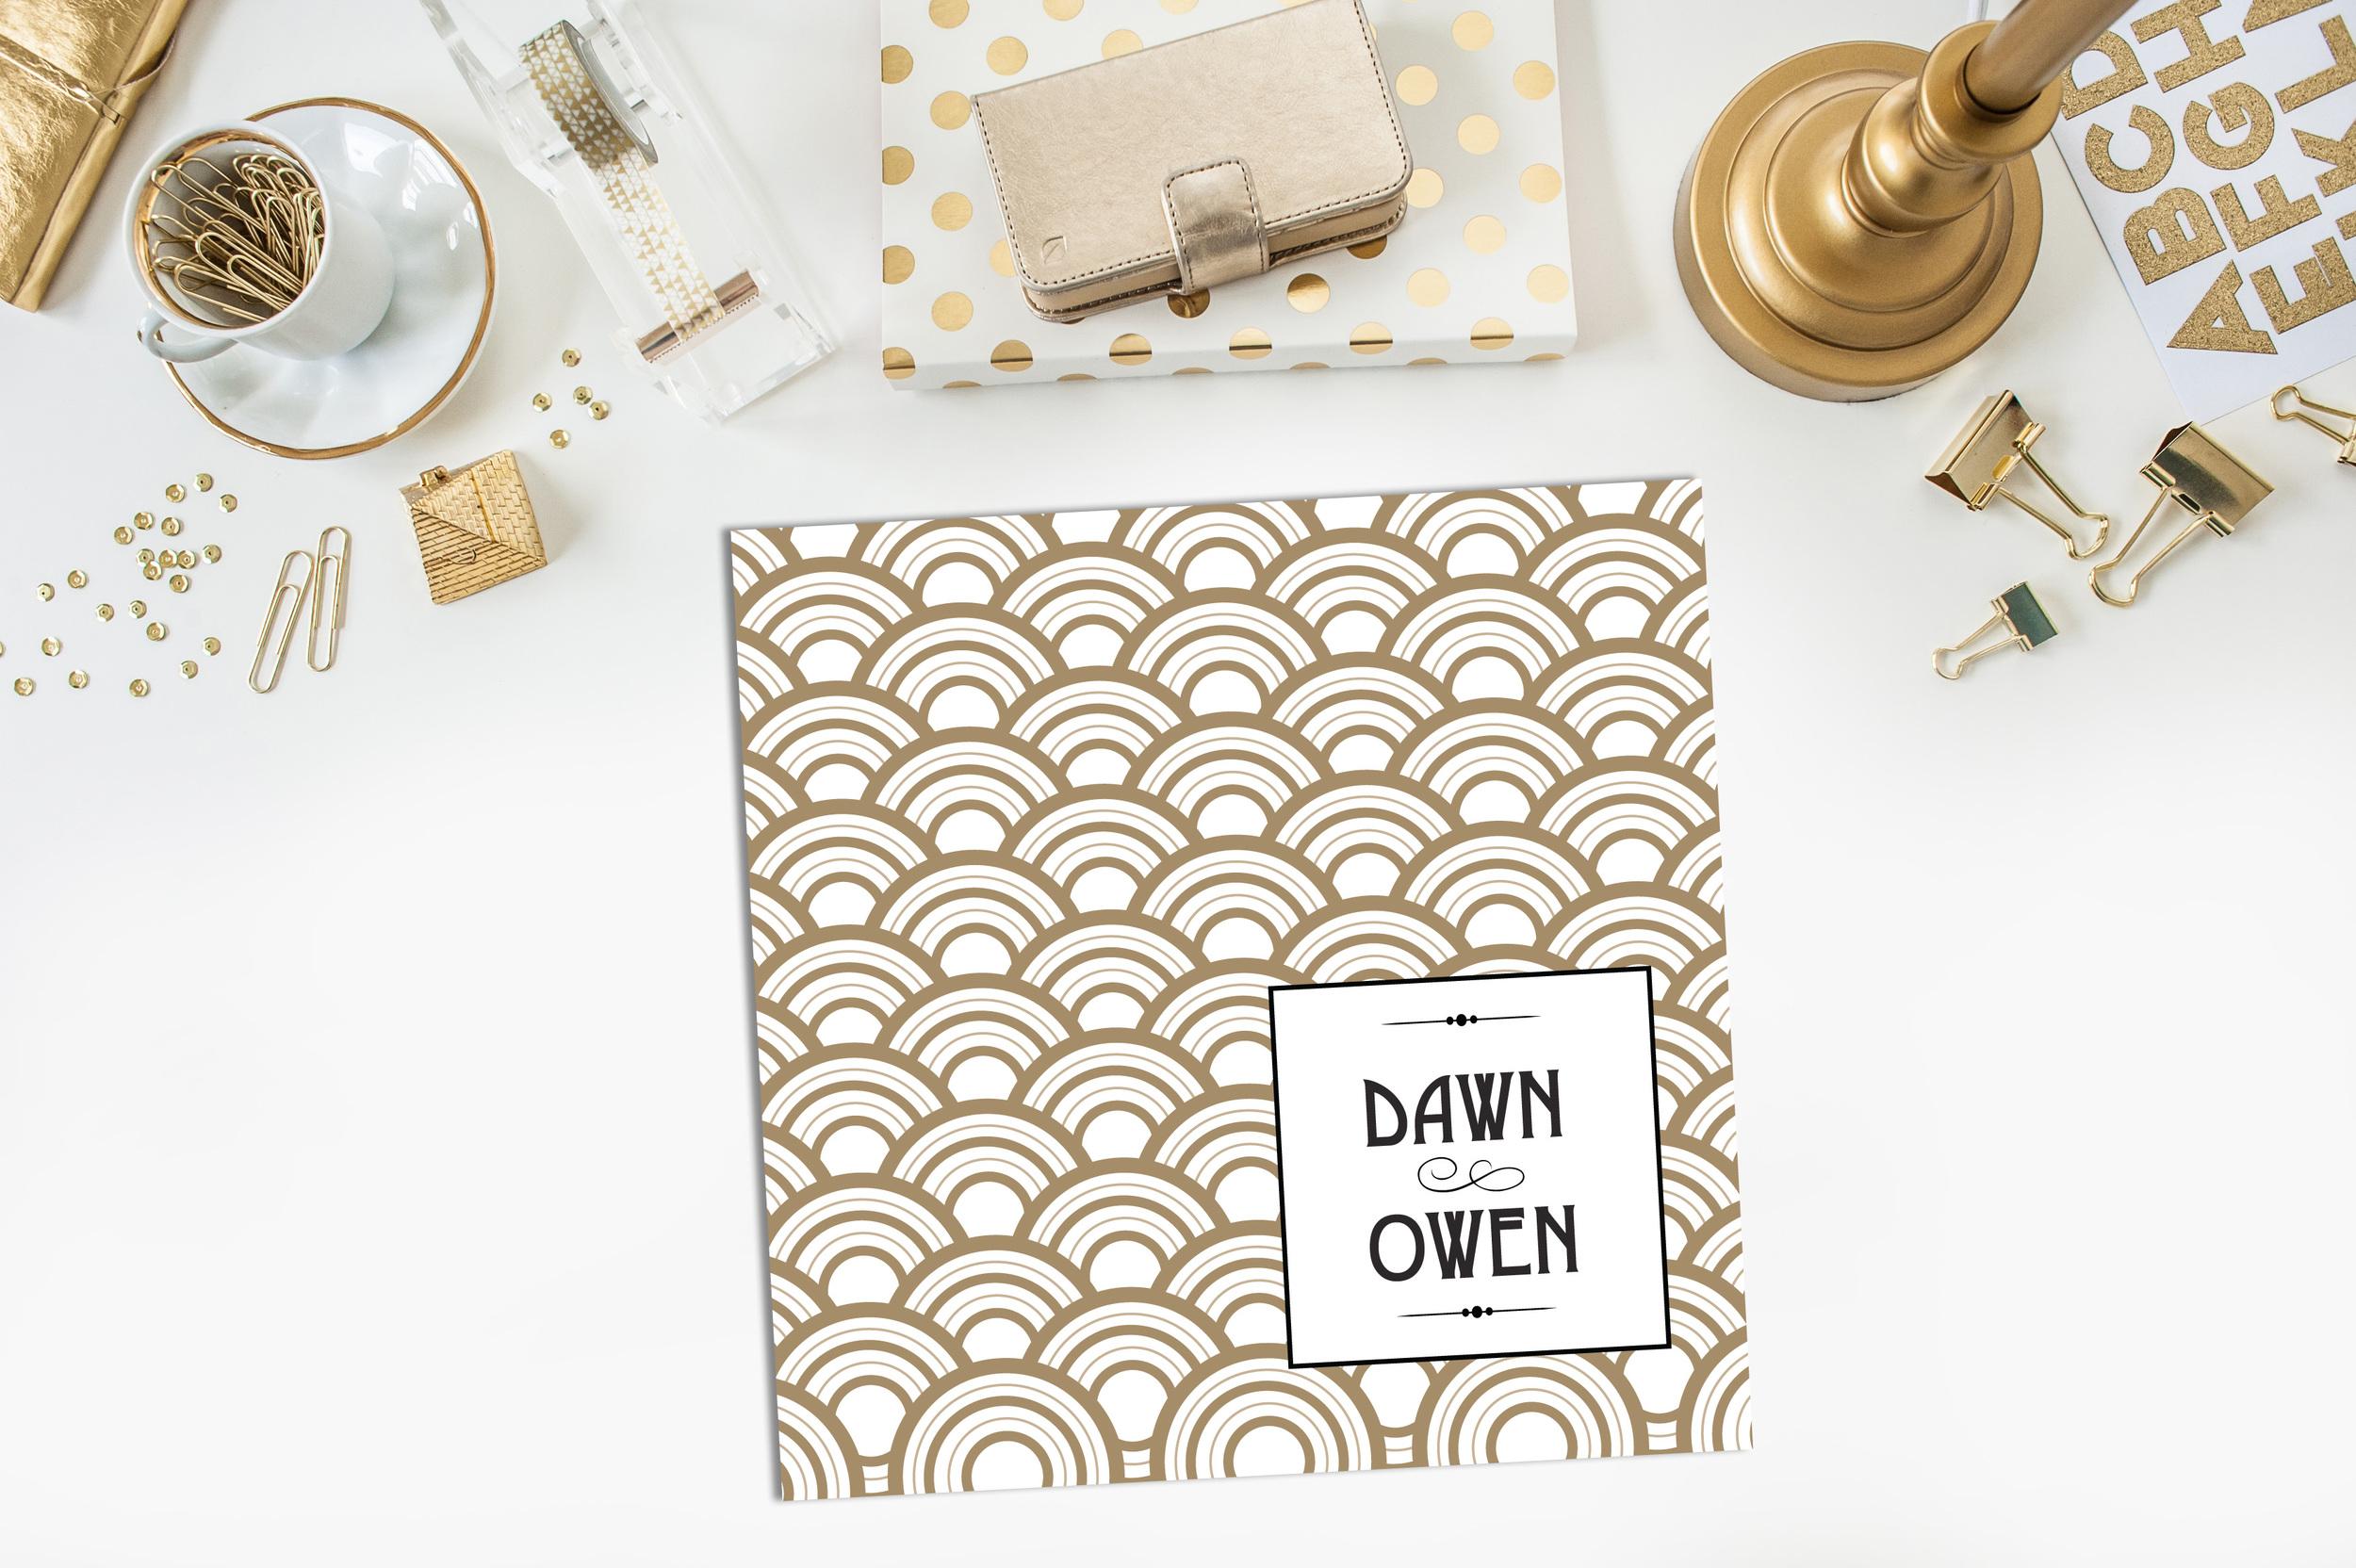 Dawn & Owen The White Letter.jpg